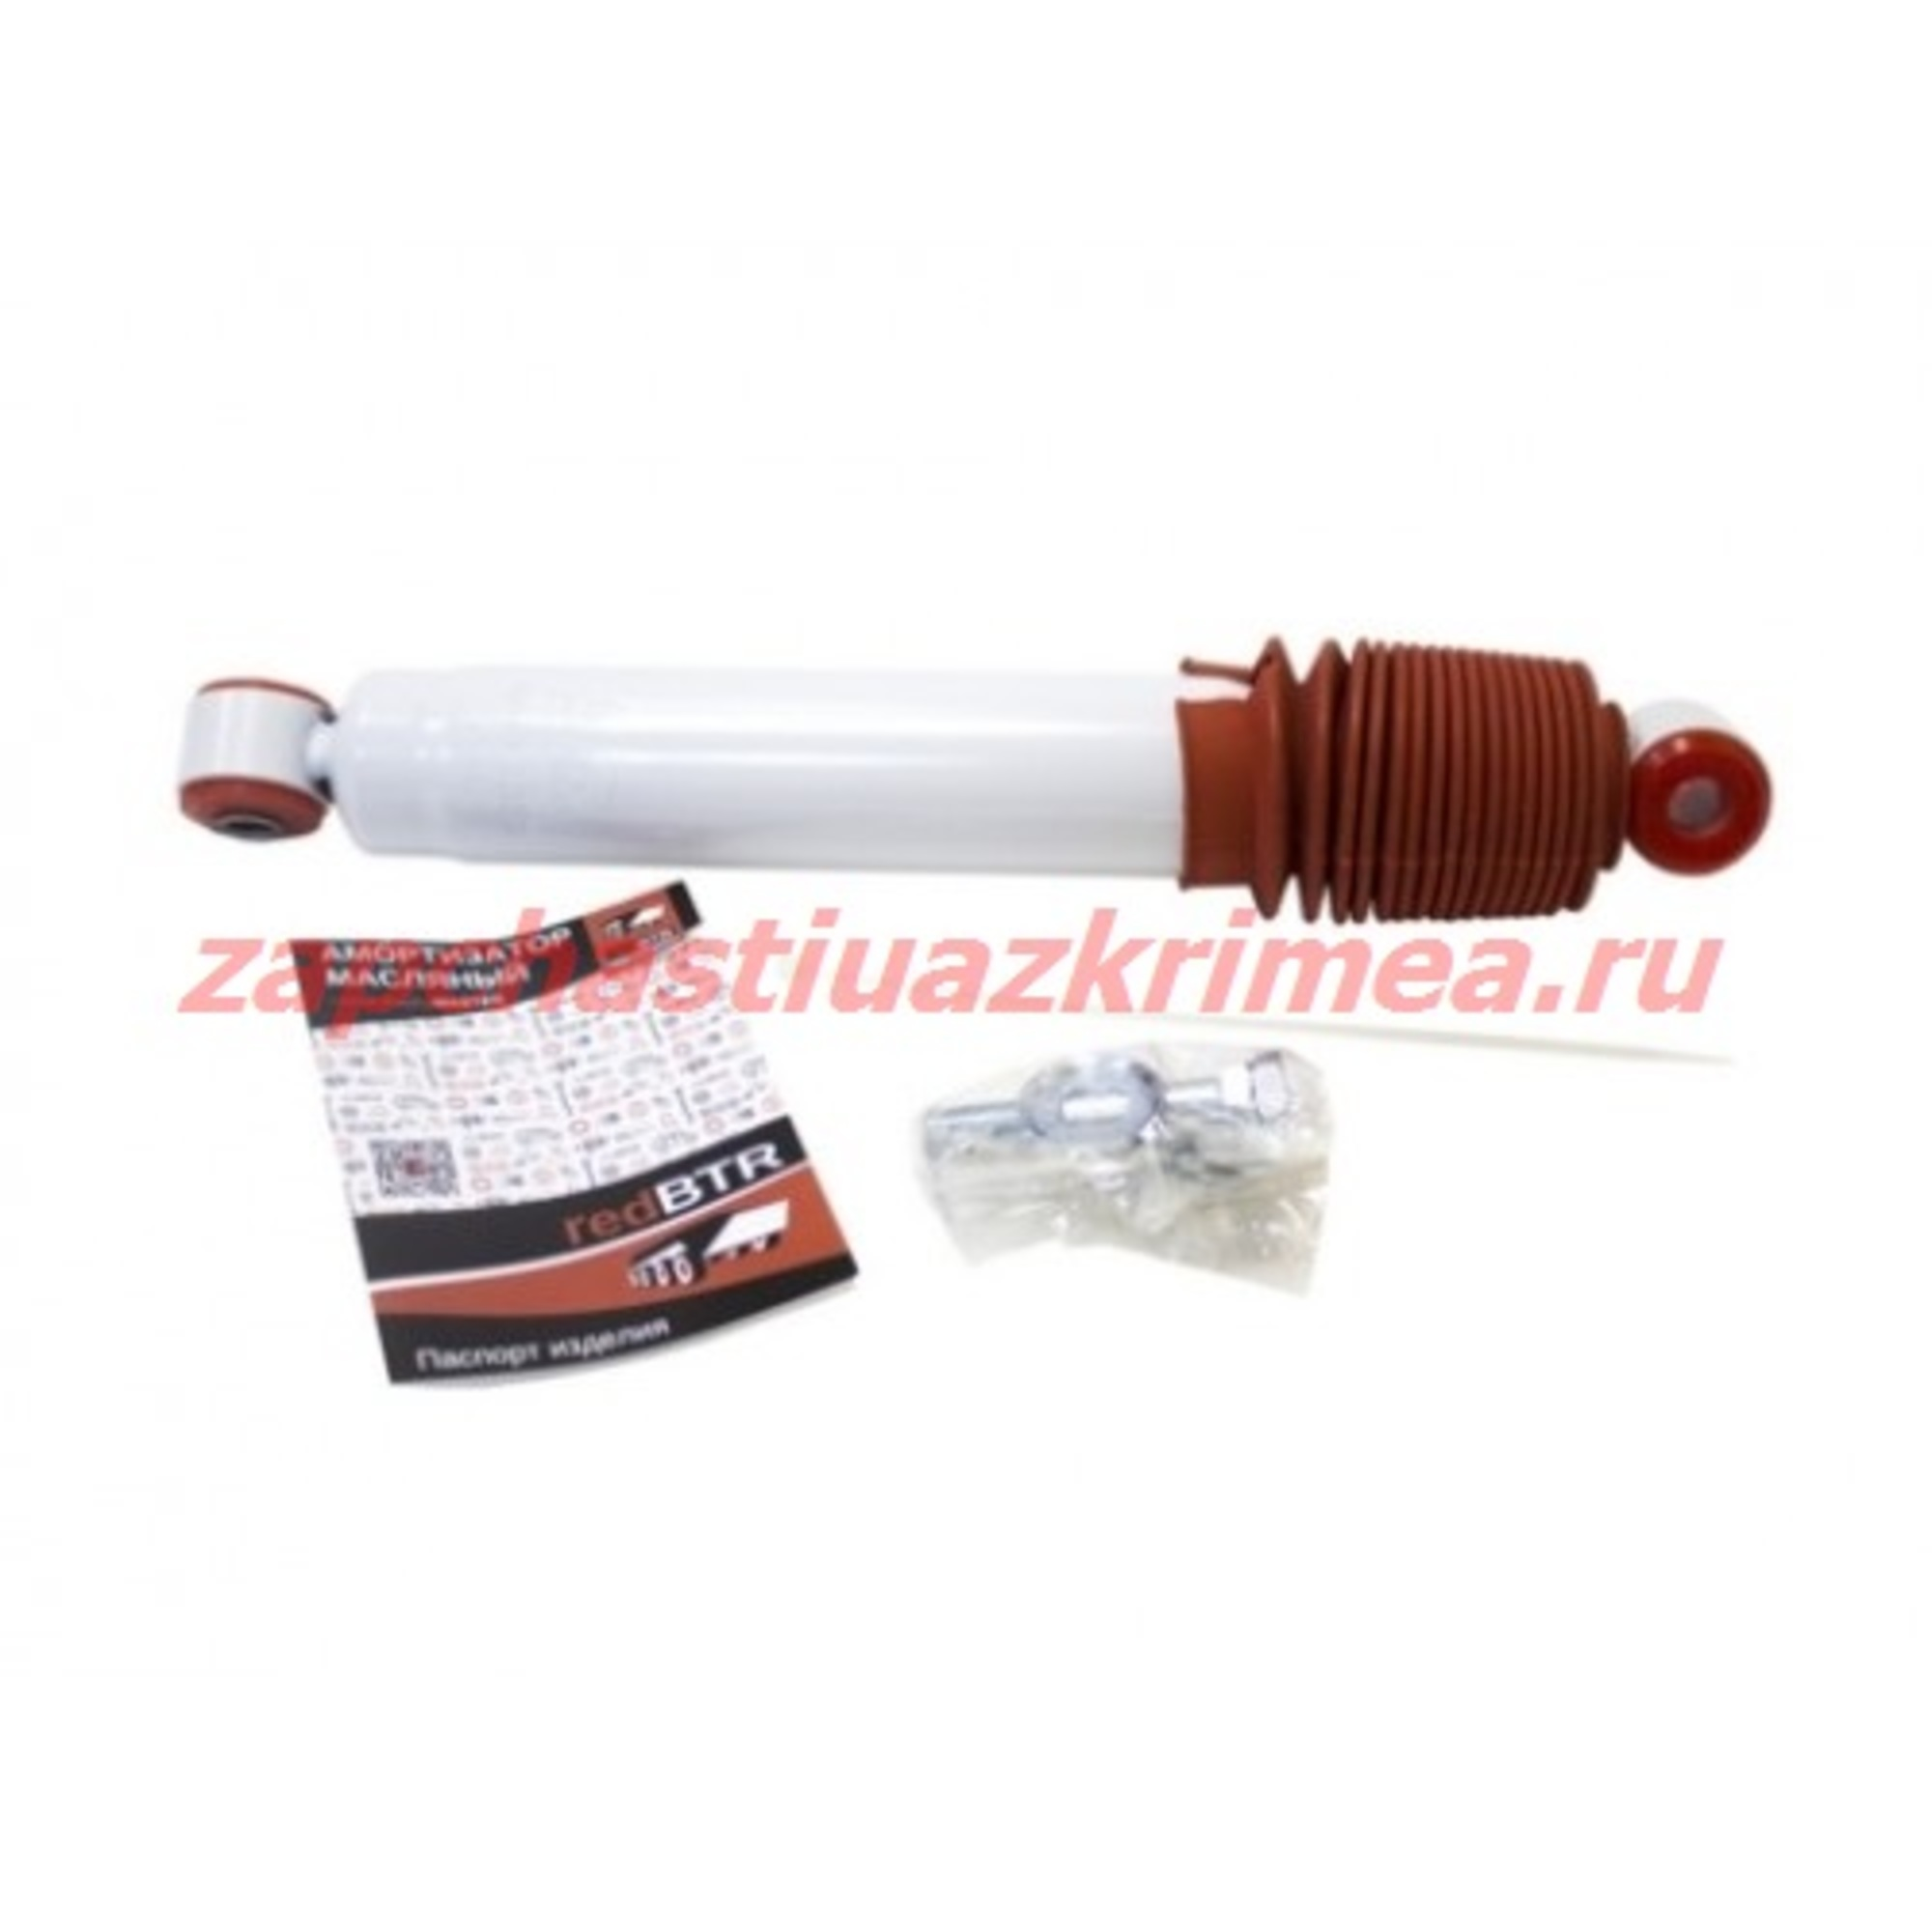 Амортизатор задний УАЗ Патриот RedBtr RB-PR1302